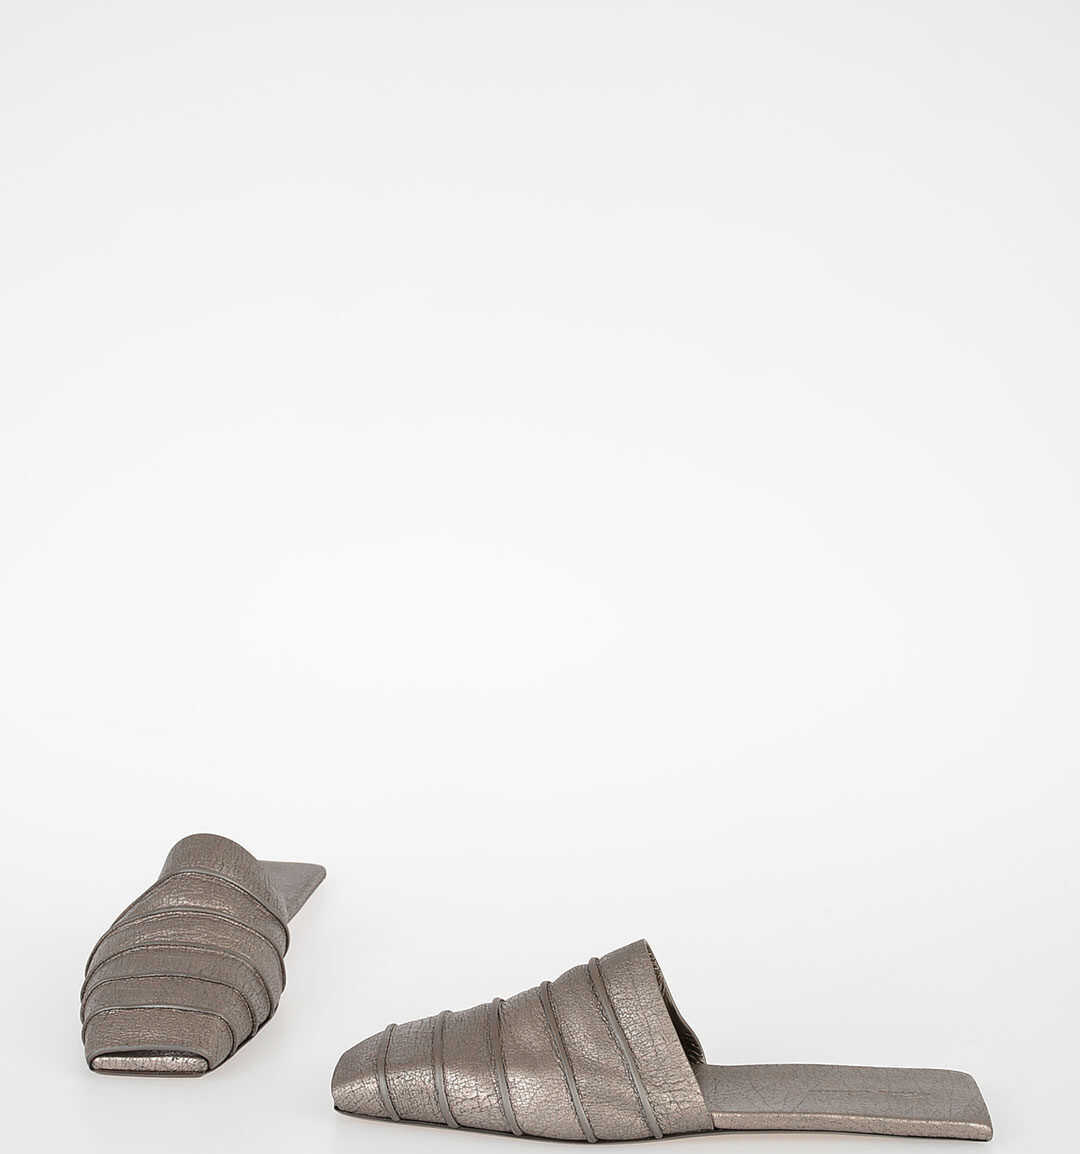 Rick Owens Leather RUHLMANN Sabot SILVER